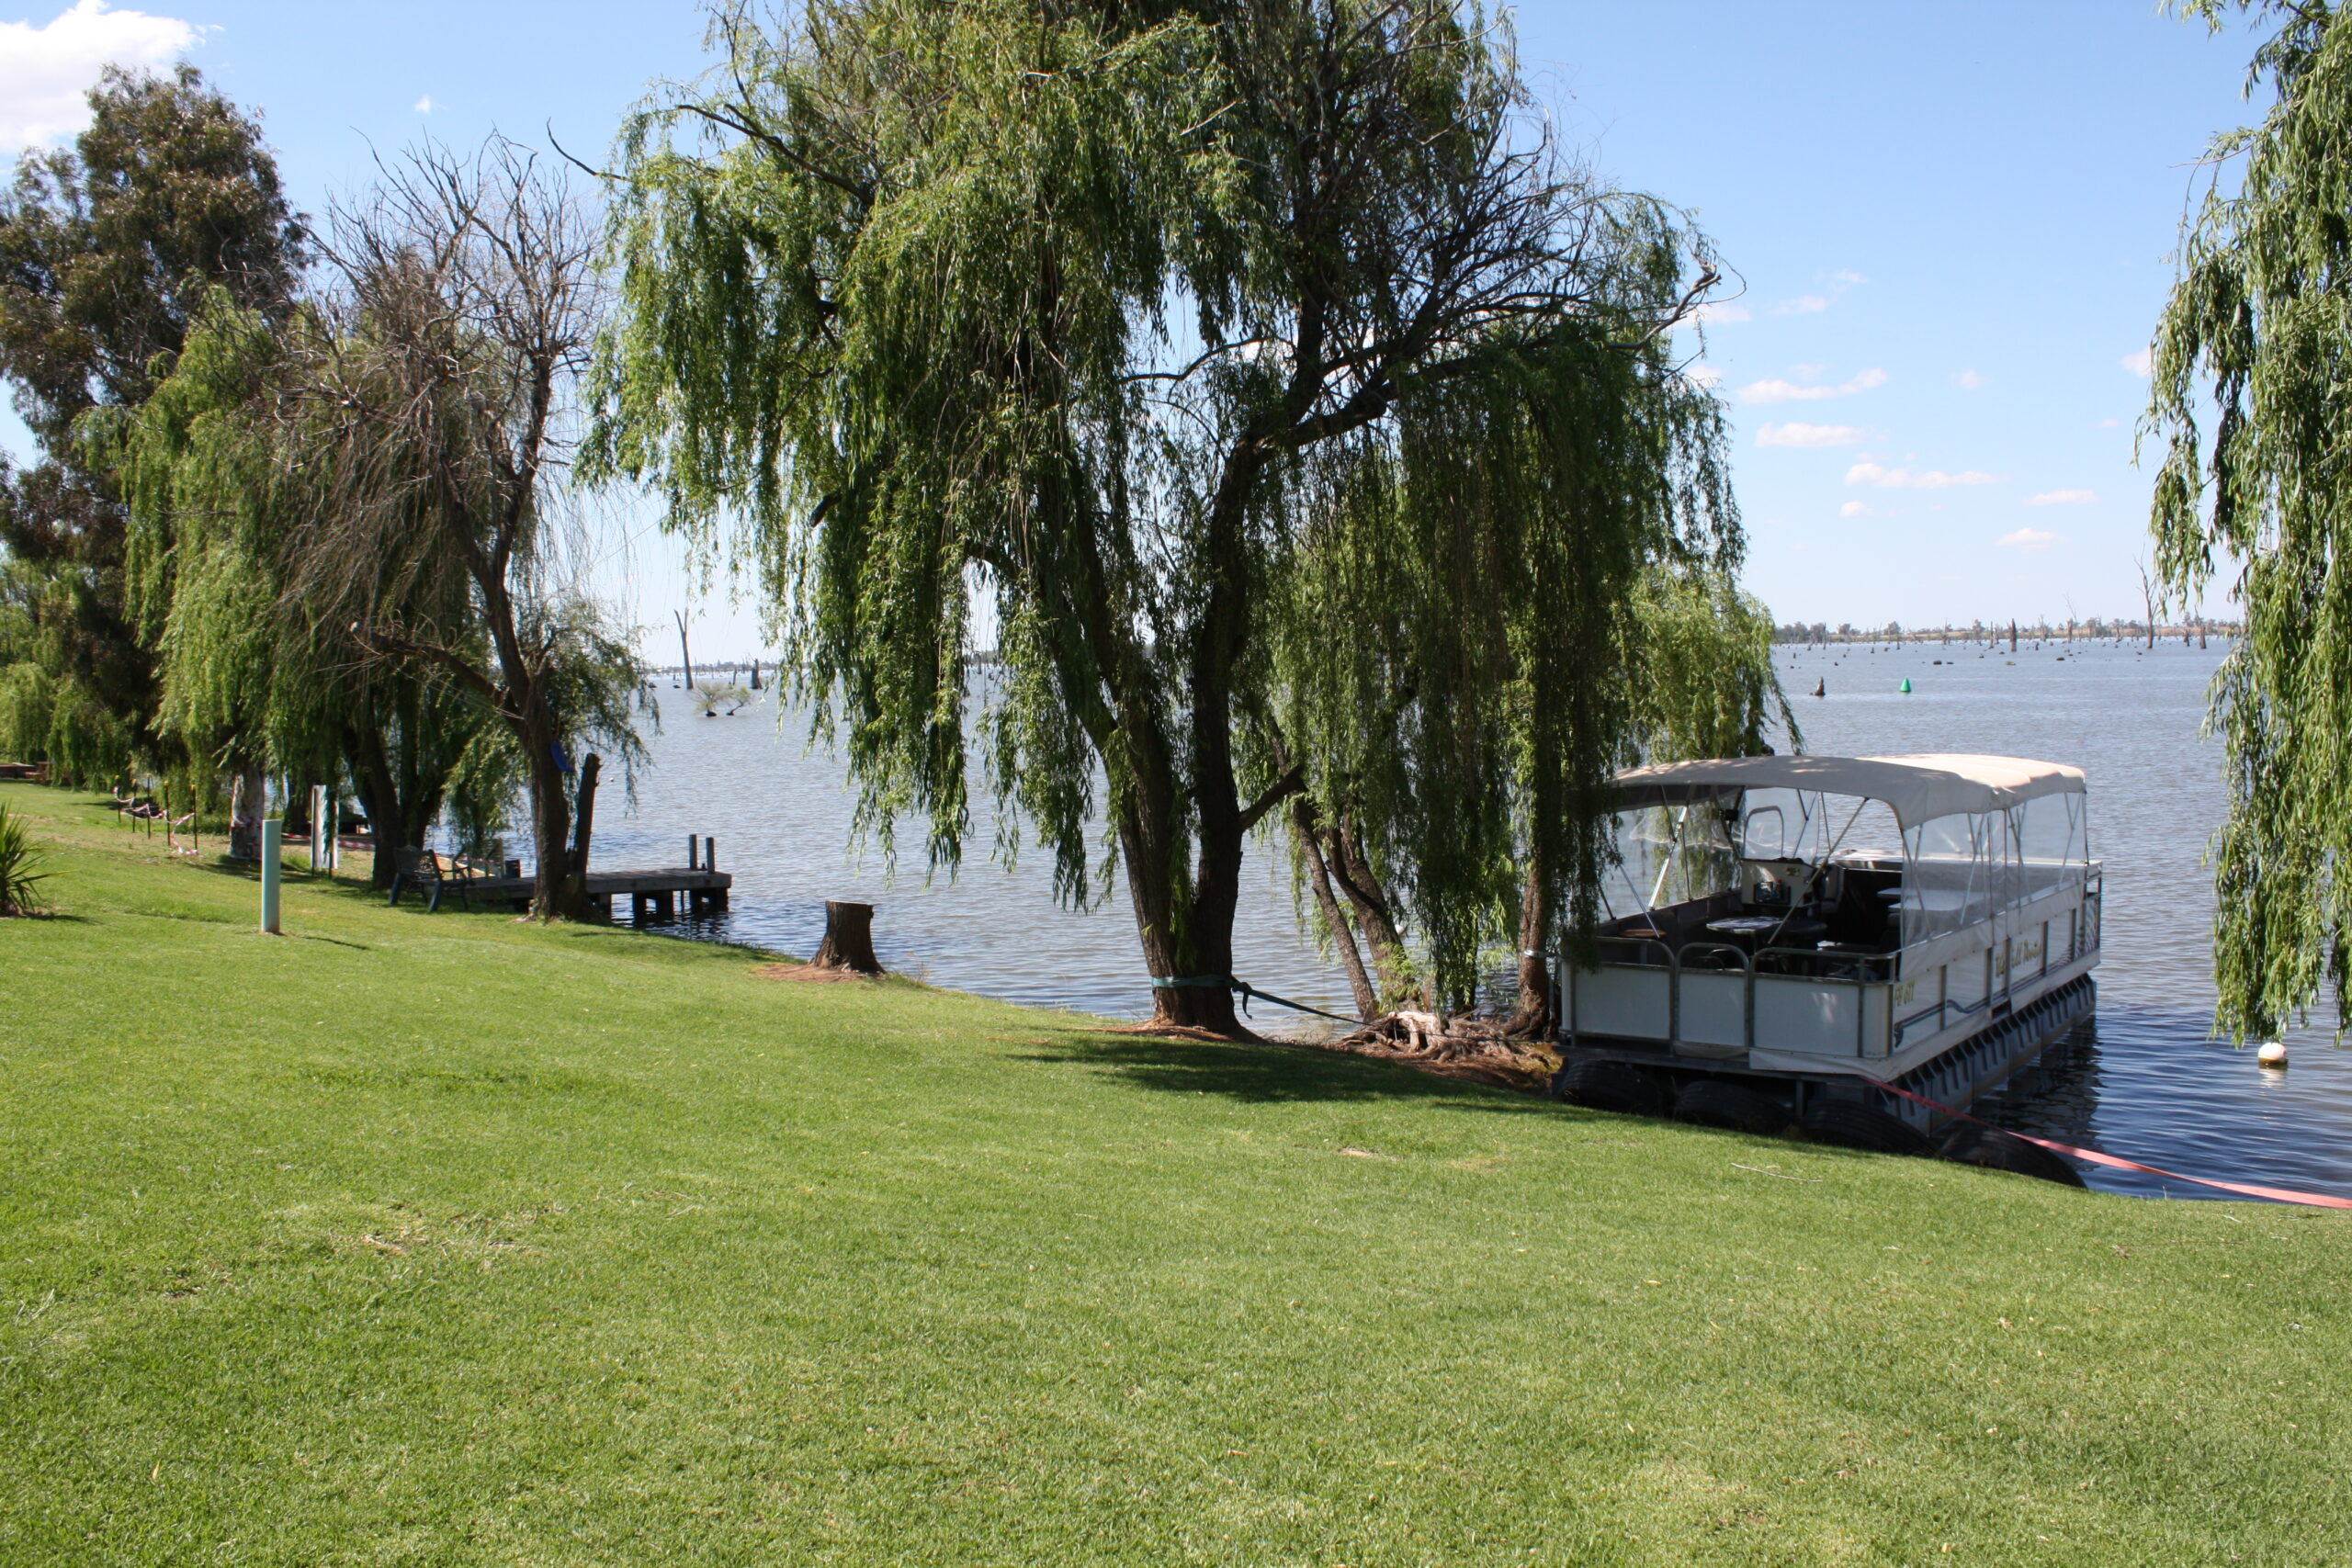 Willow Island